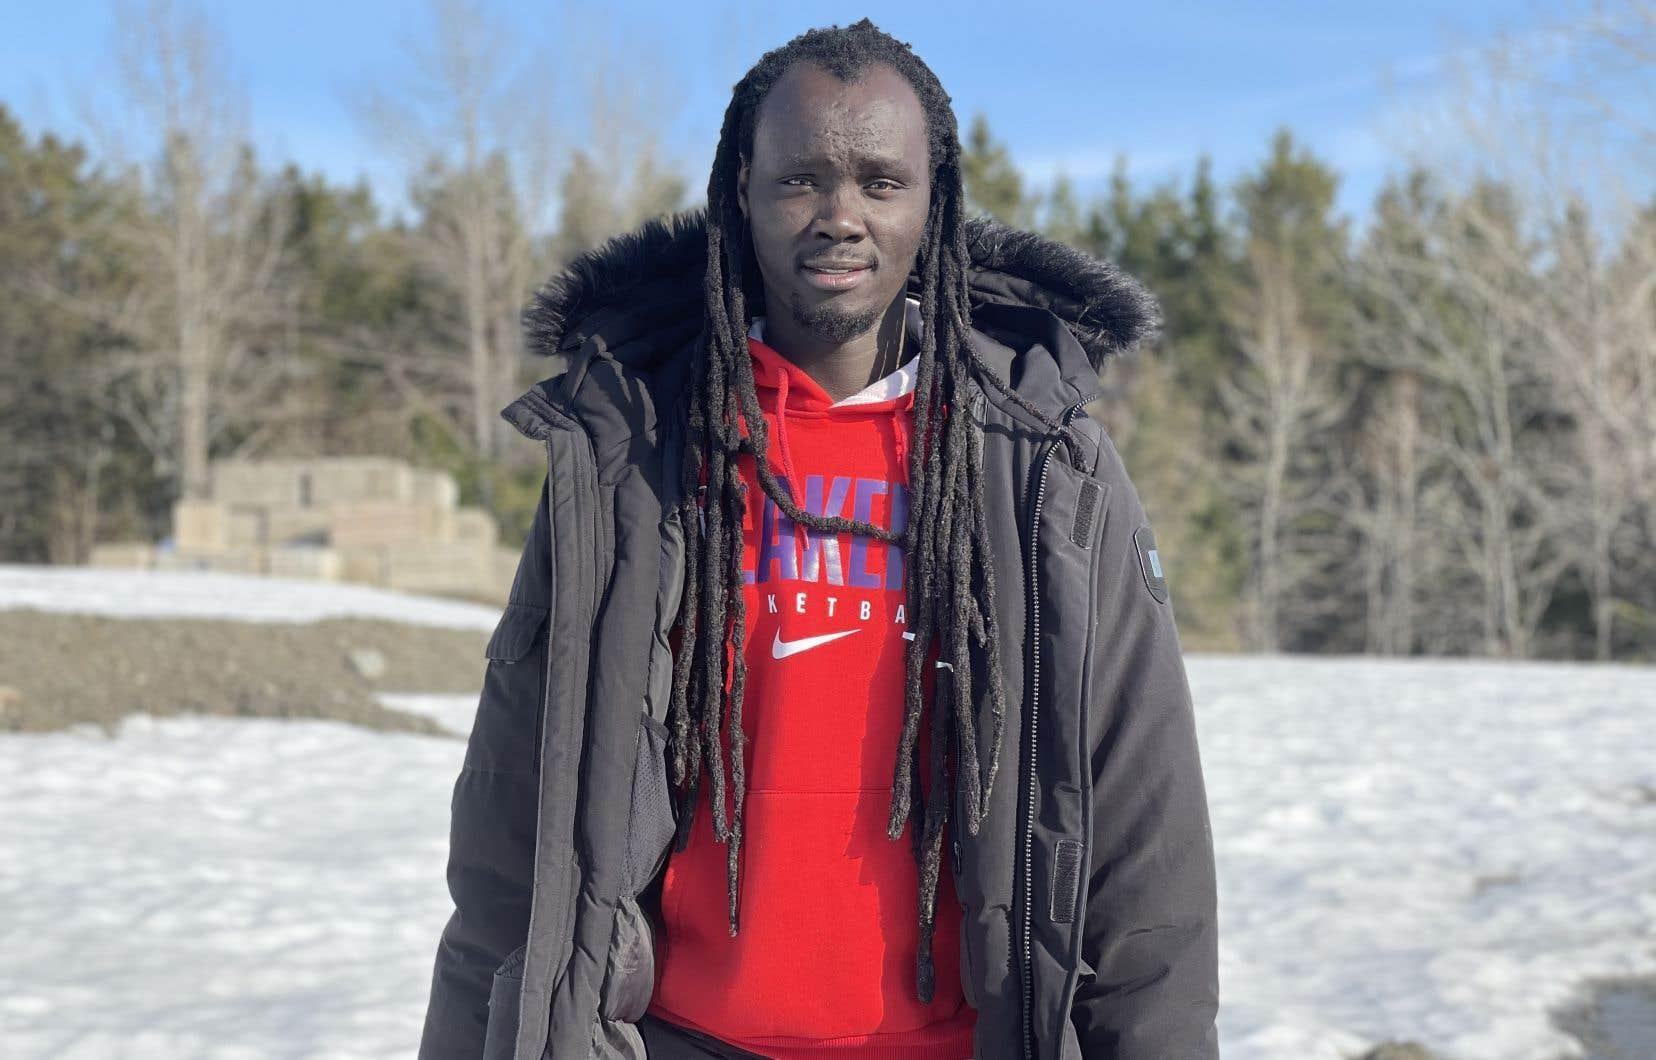 Baye Cheikh Diop à la sortie de son travail à Thetford Mines